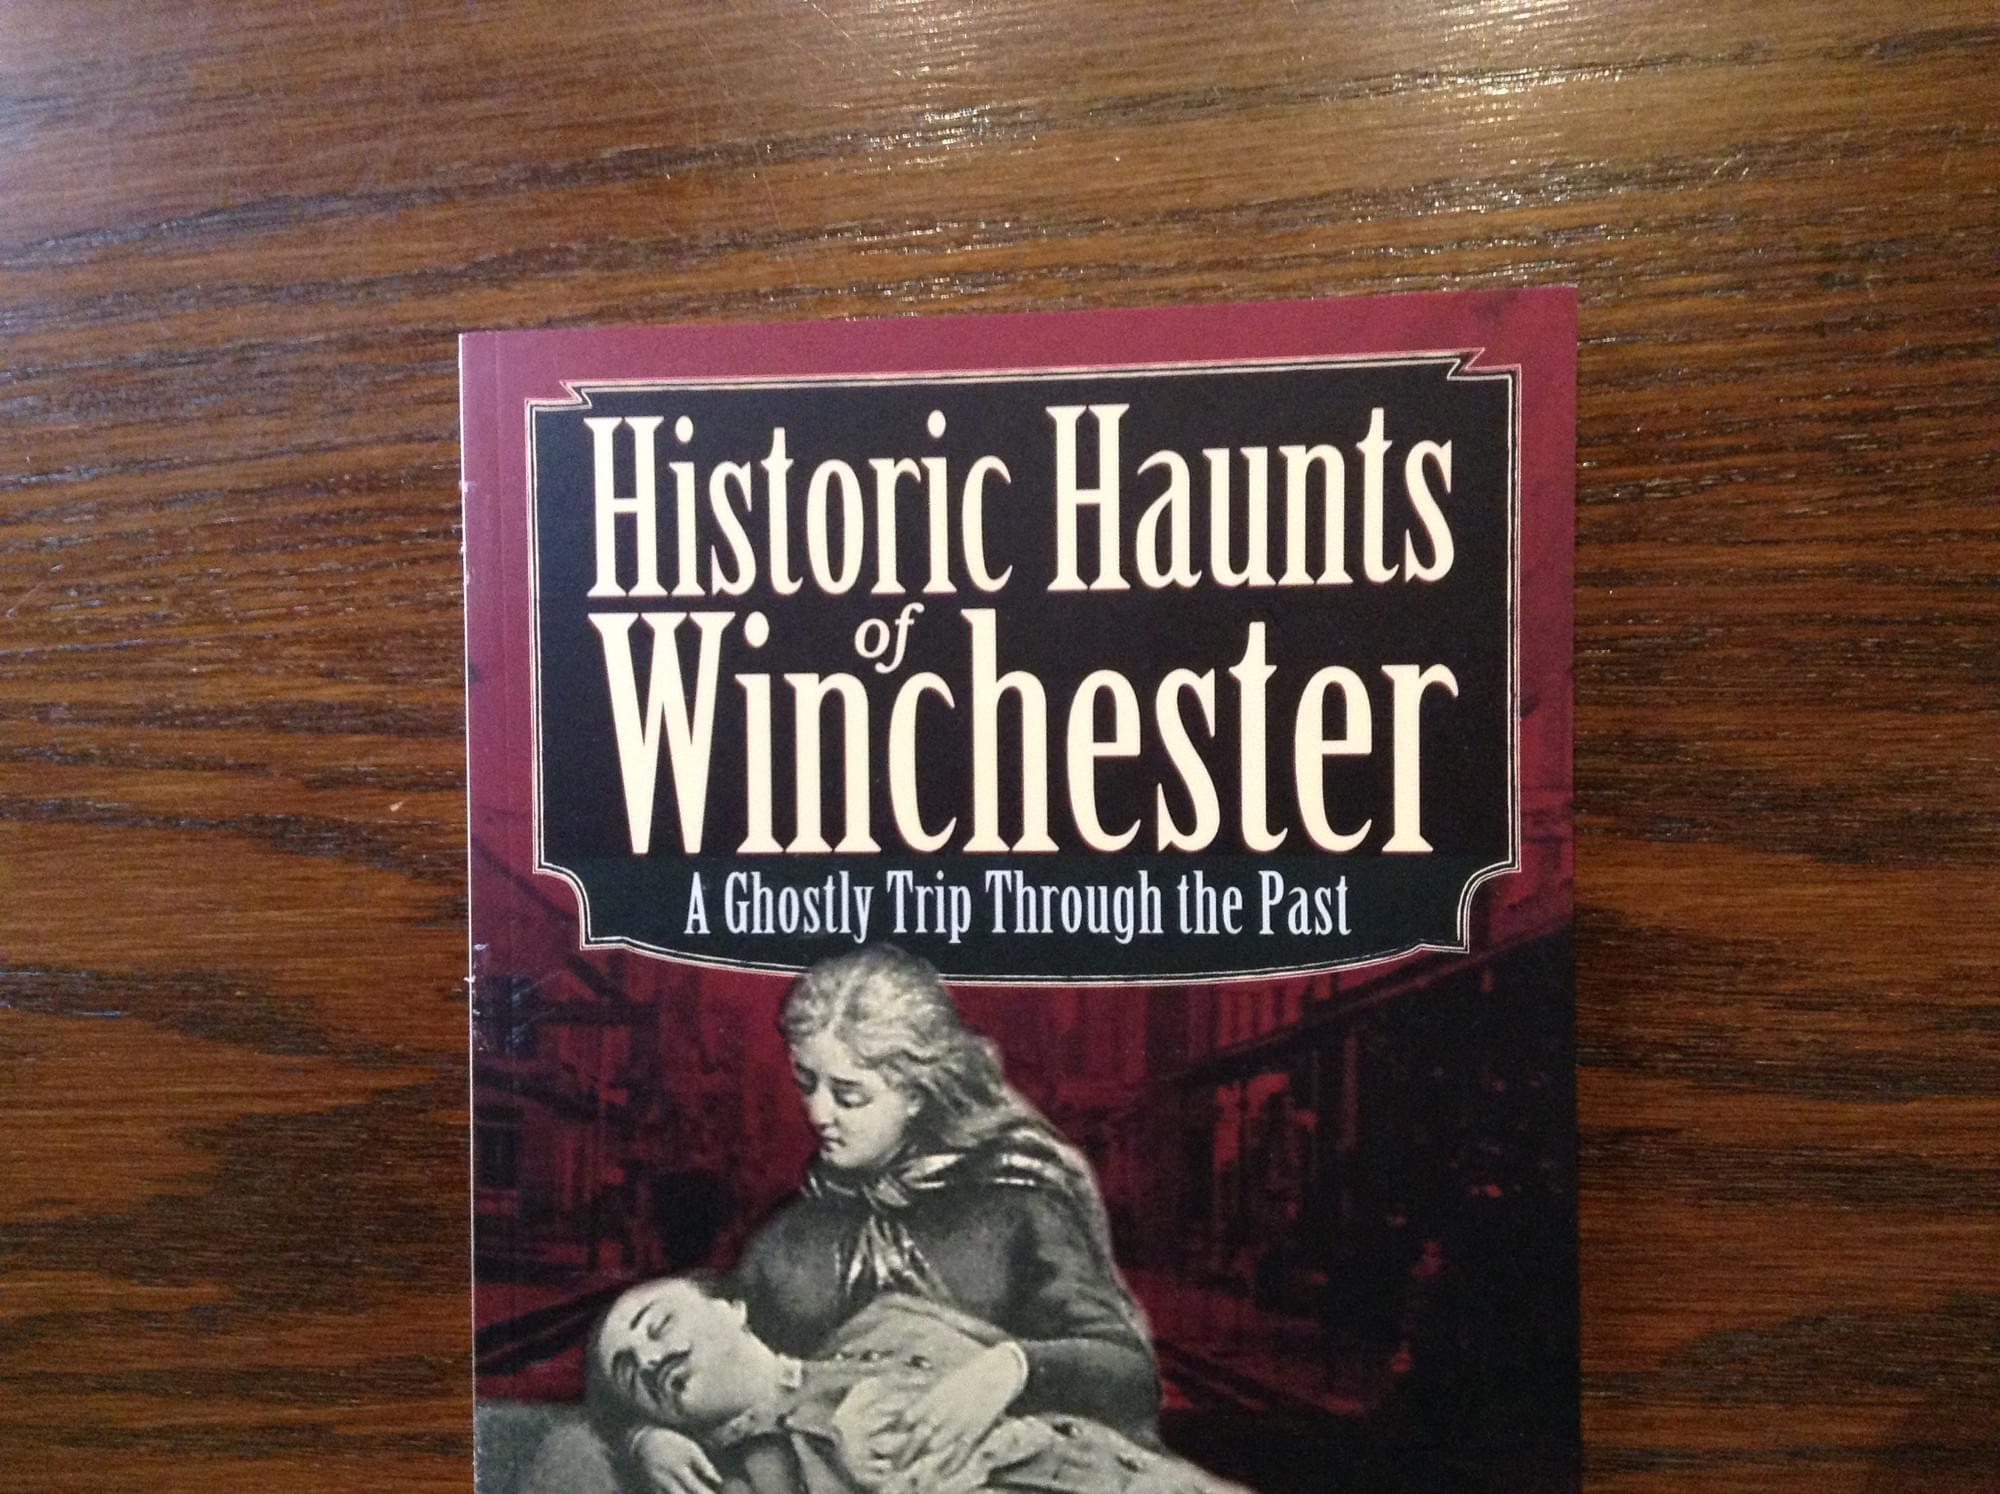 Historic Haunts of Winchester